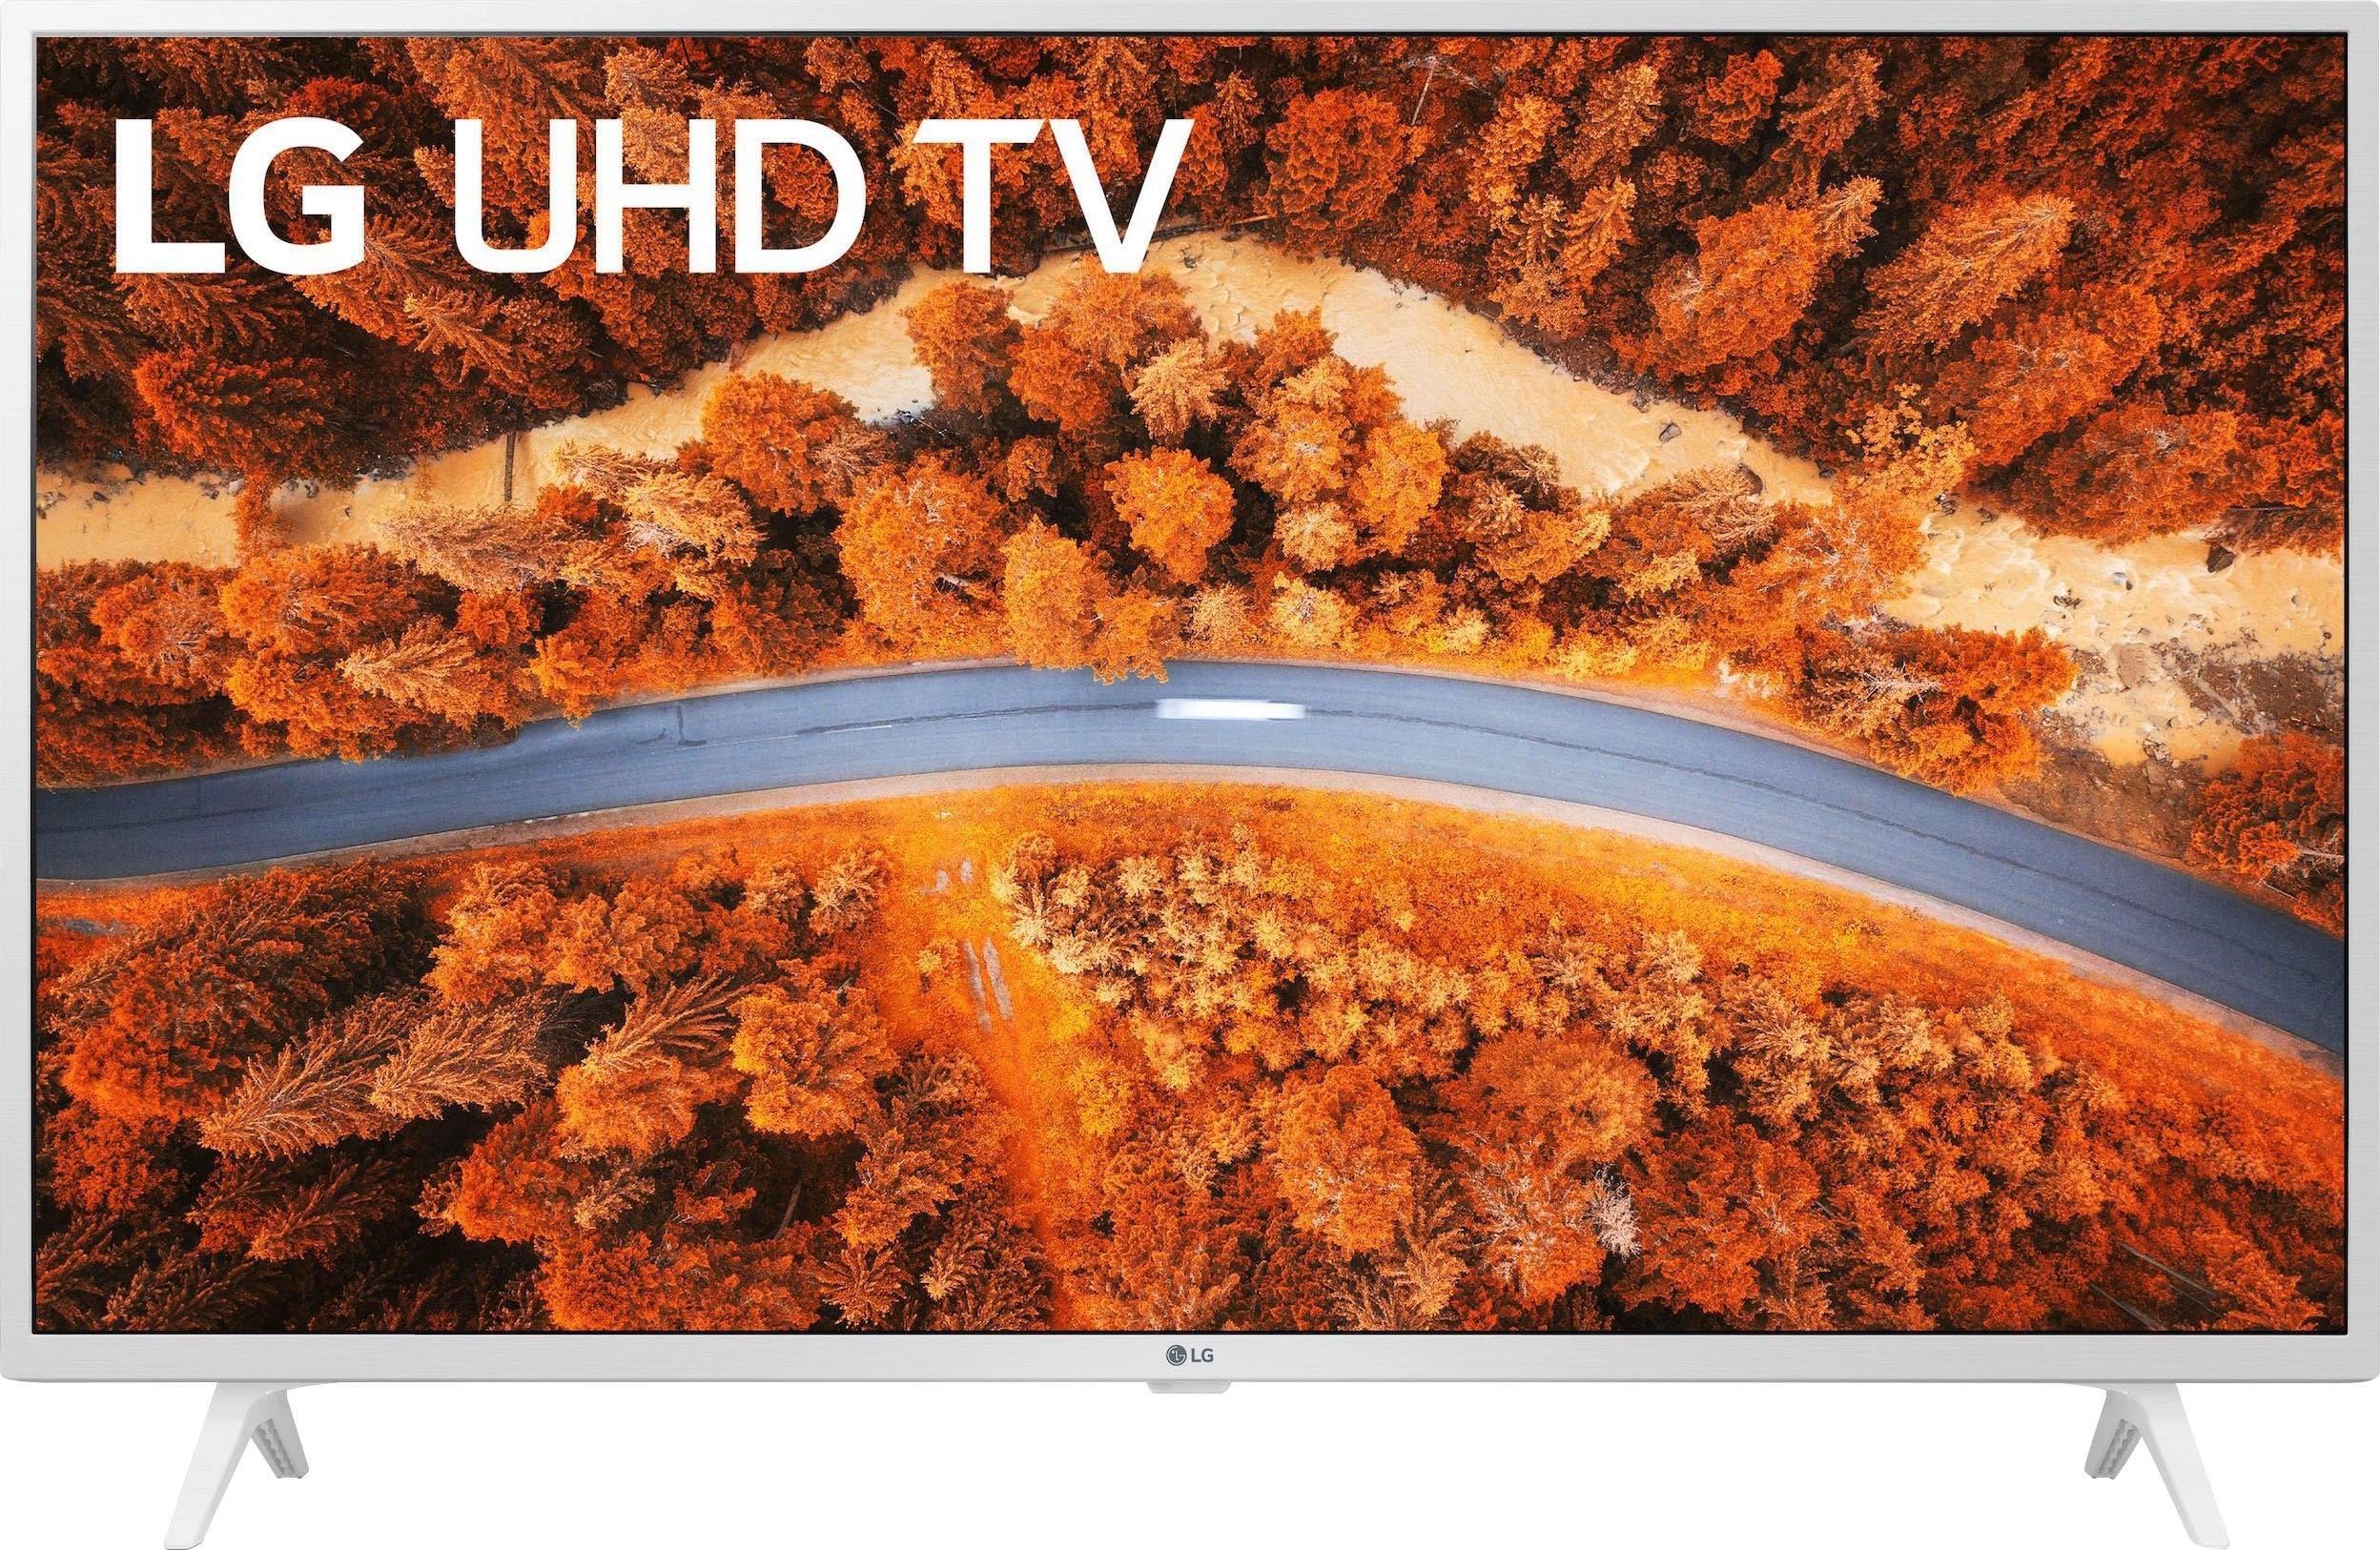 LG LCD-LED-TV 43UP76909LE, 108 cm / 43